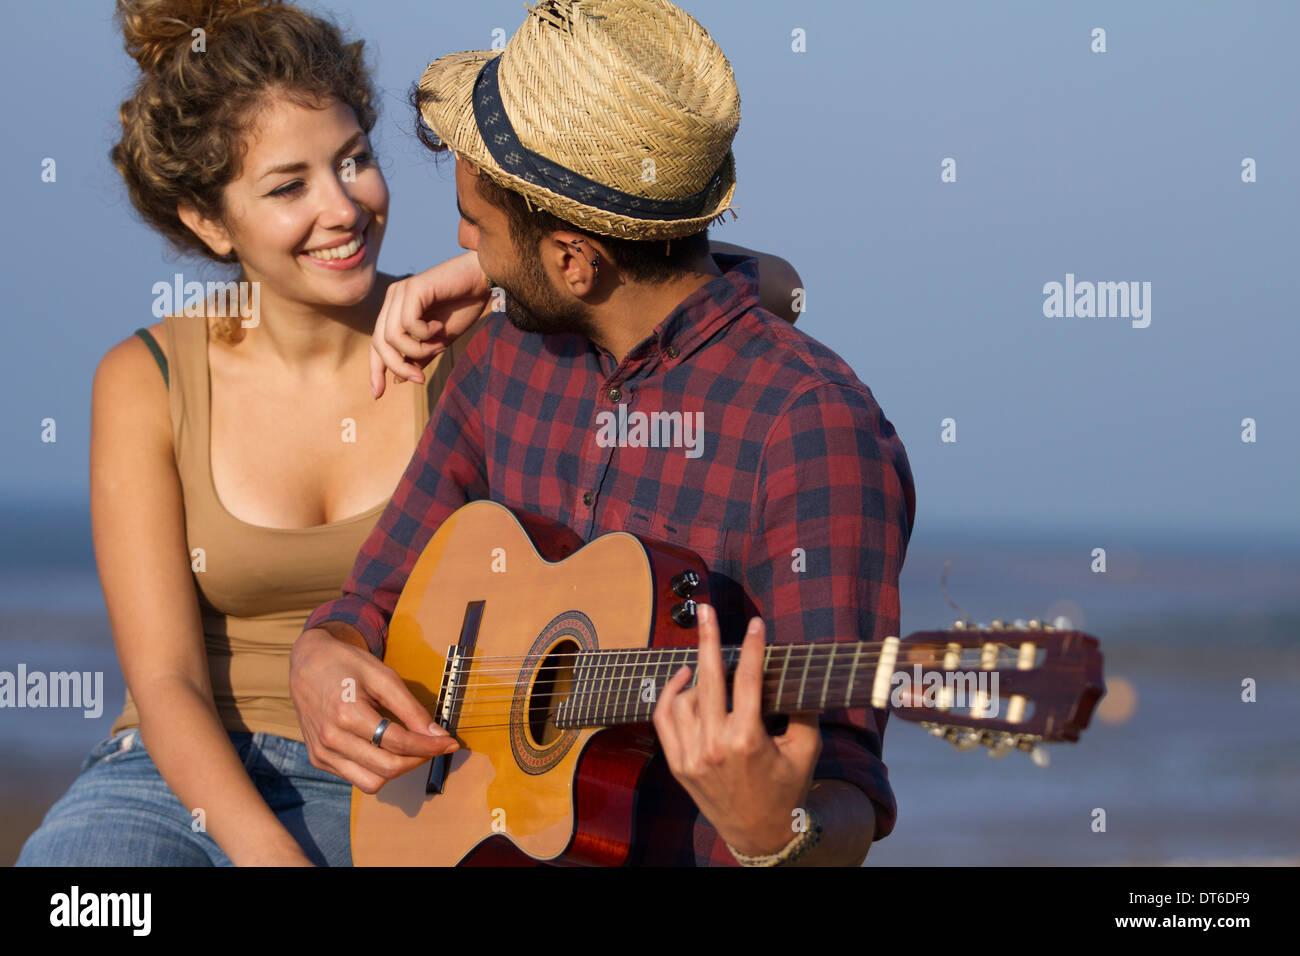 Young couple, man playing guitar - Stock Image